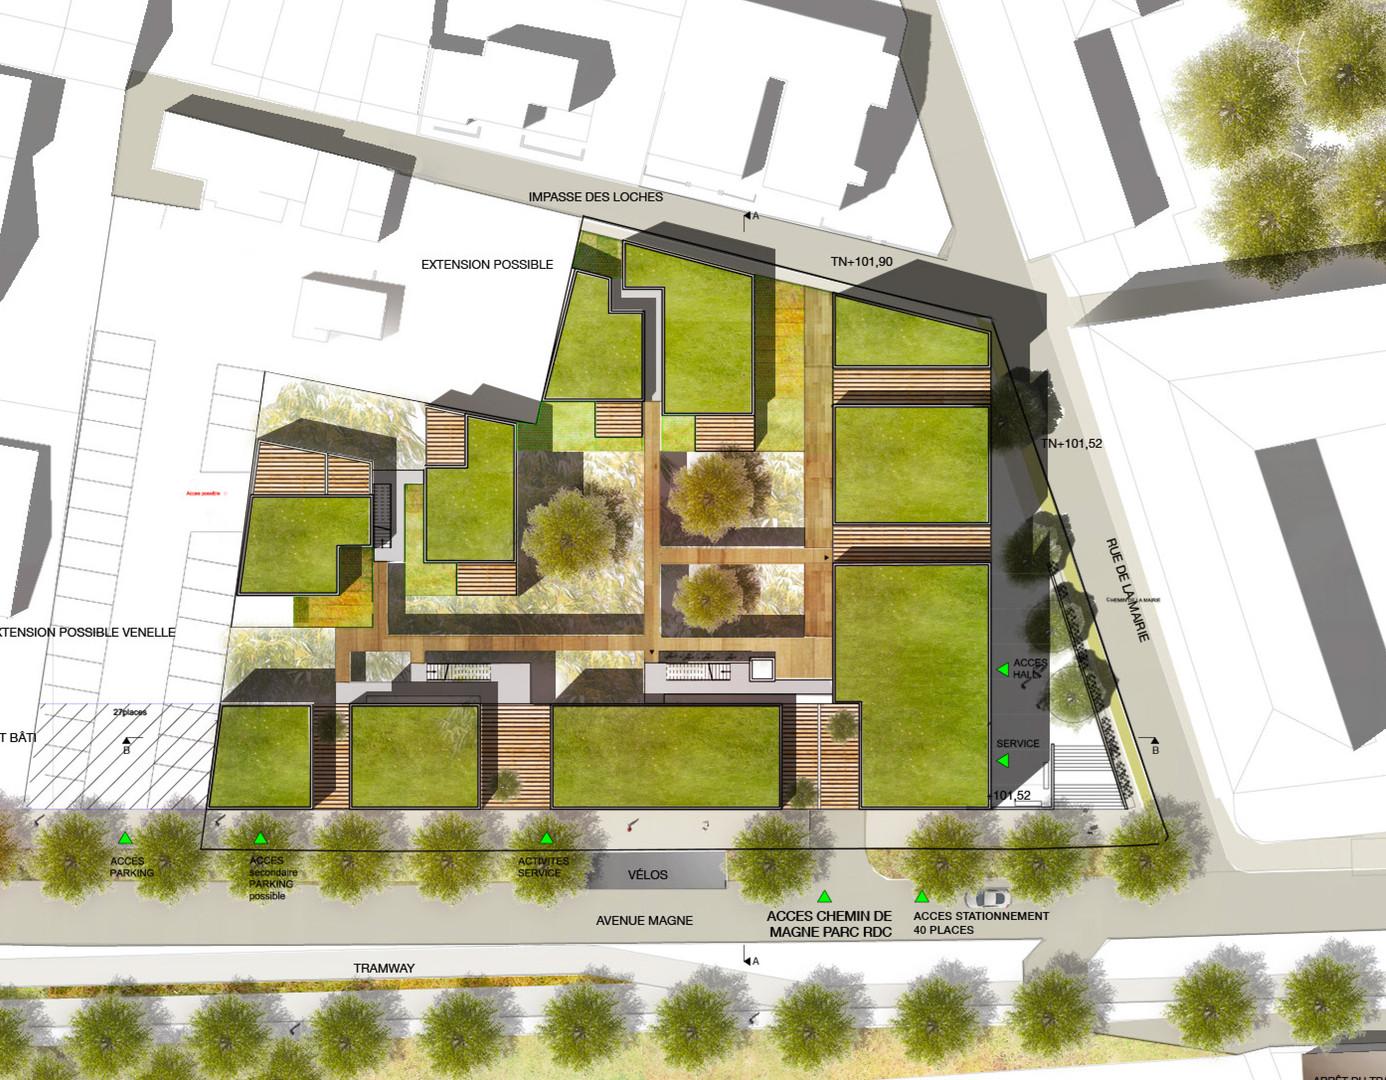 Frutoso-architecte-51 logements2.jpg